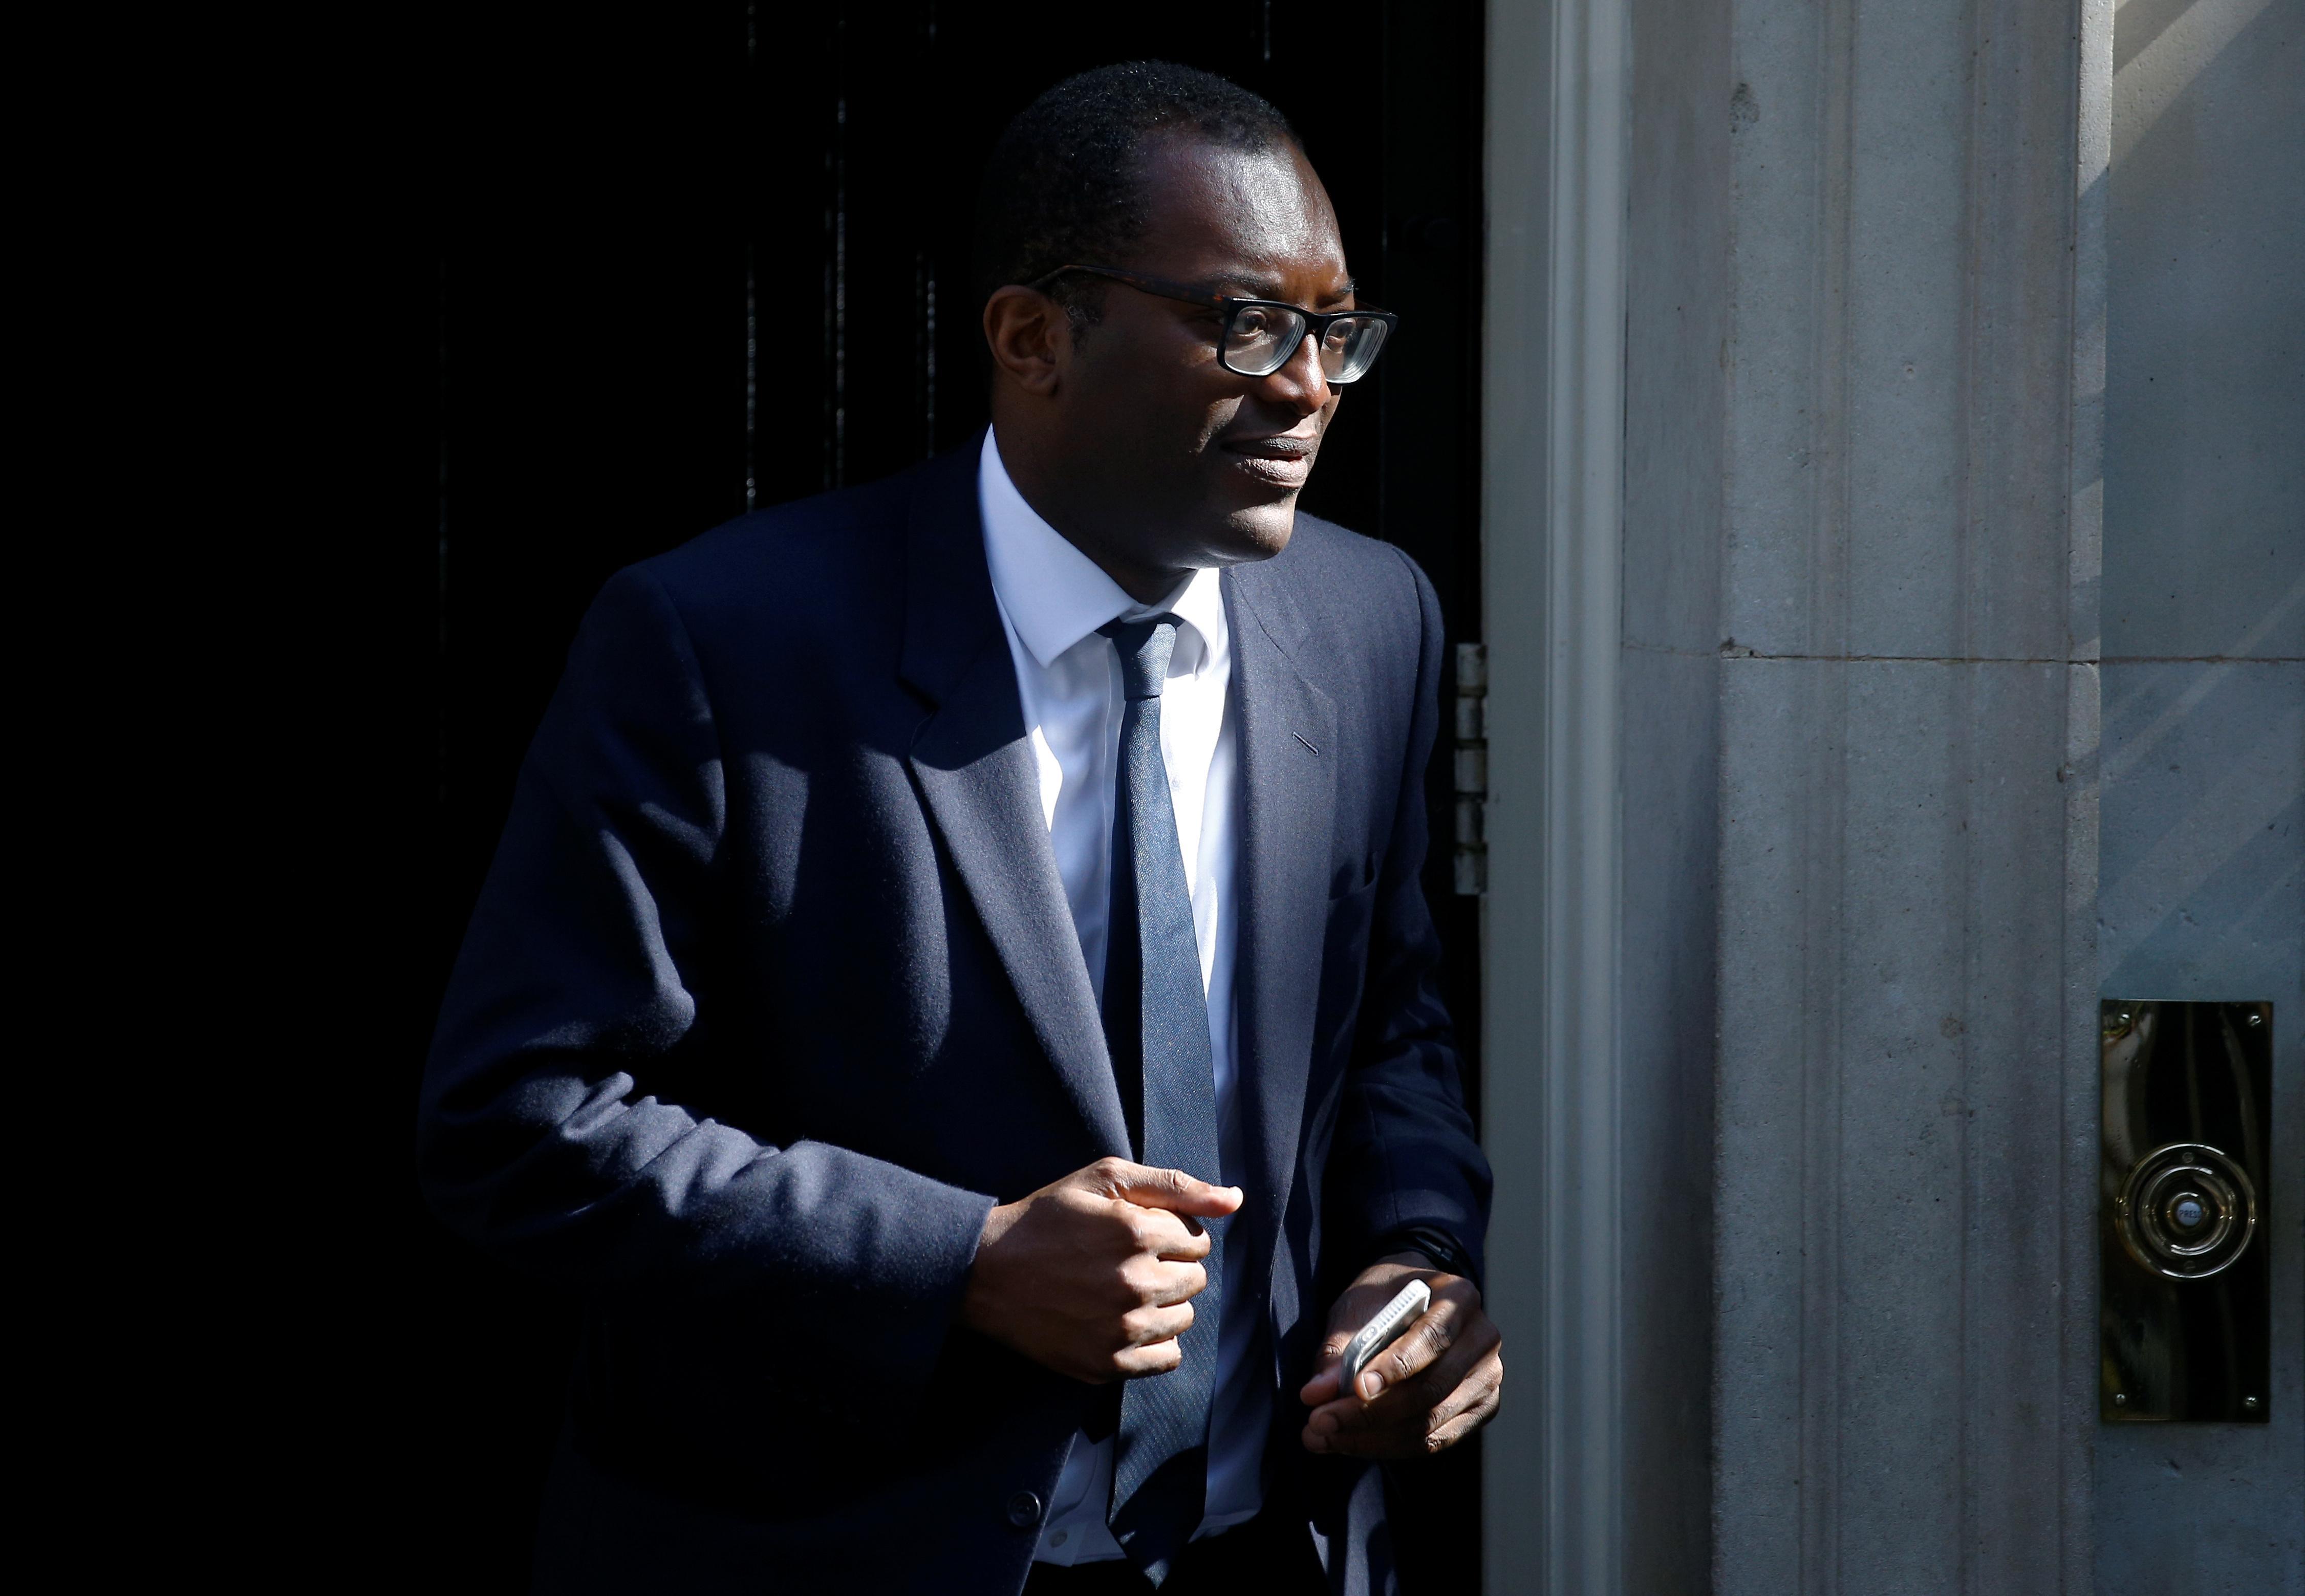 UK minister dismisses 'scaremongering' over leaked Brexit report